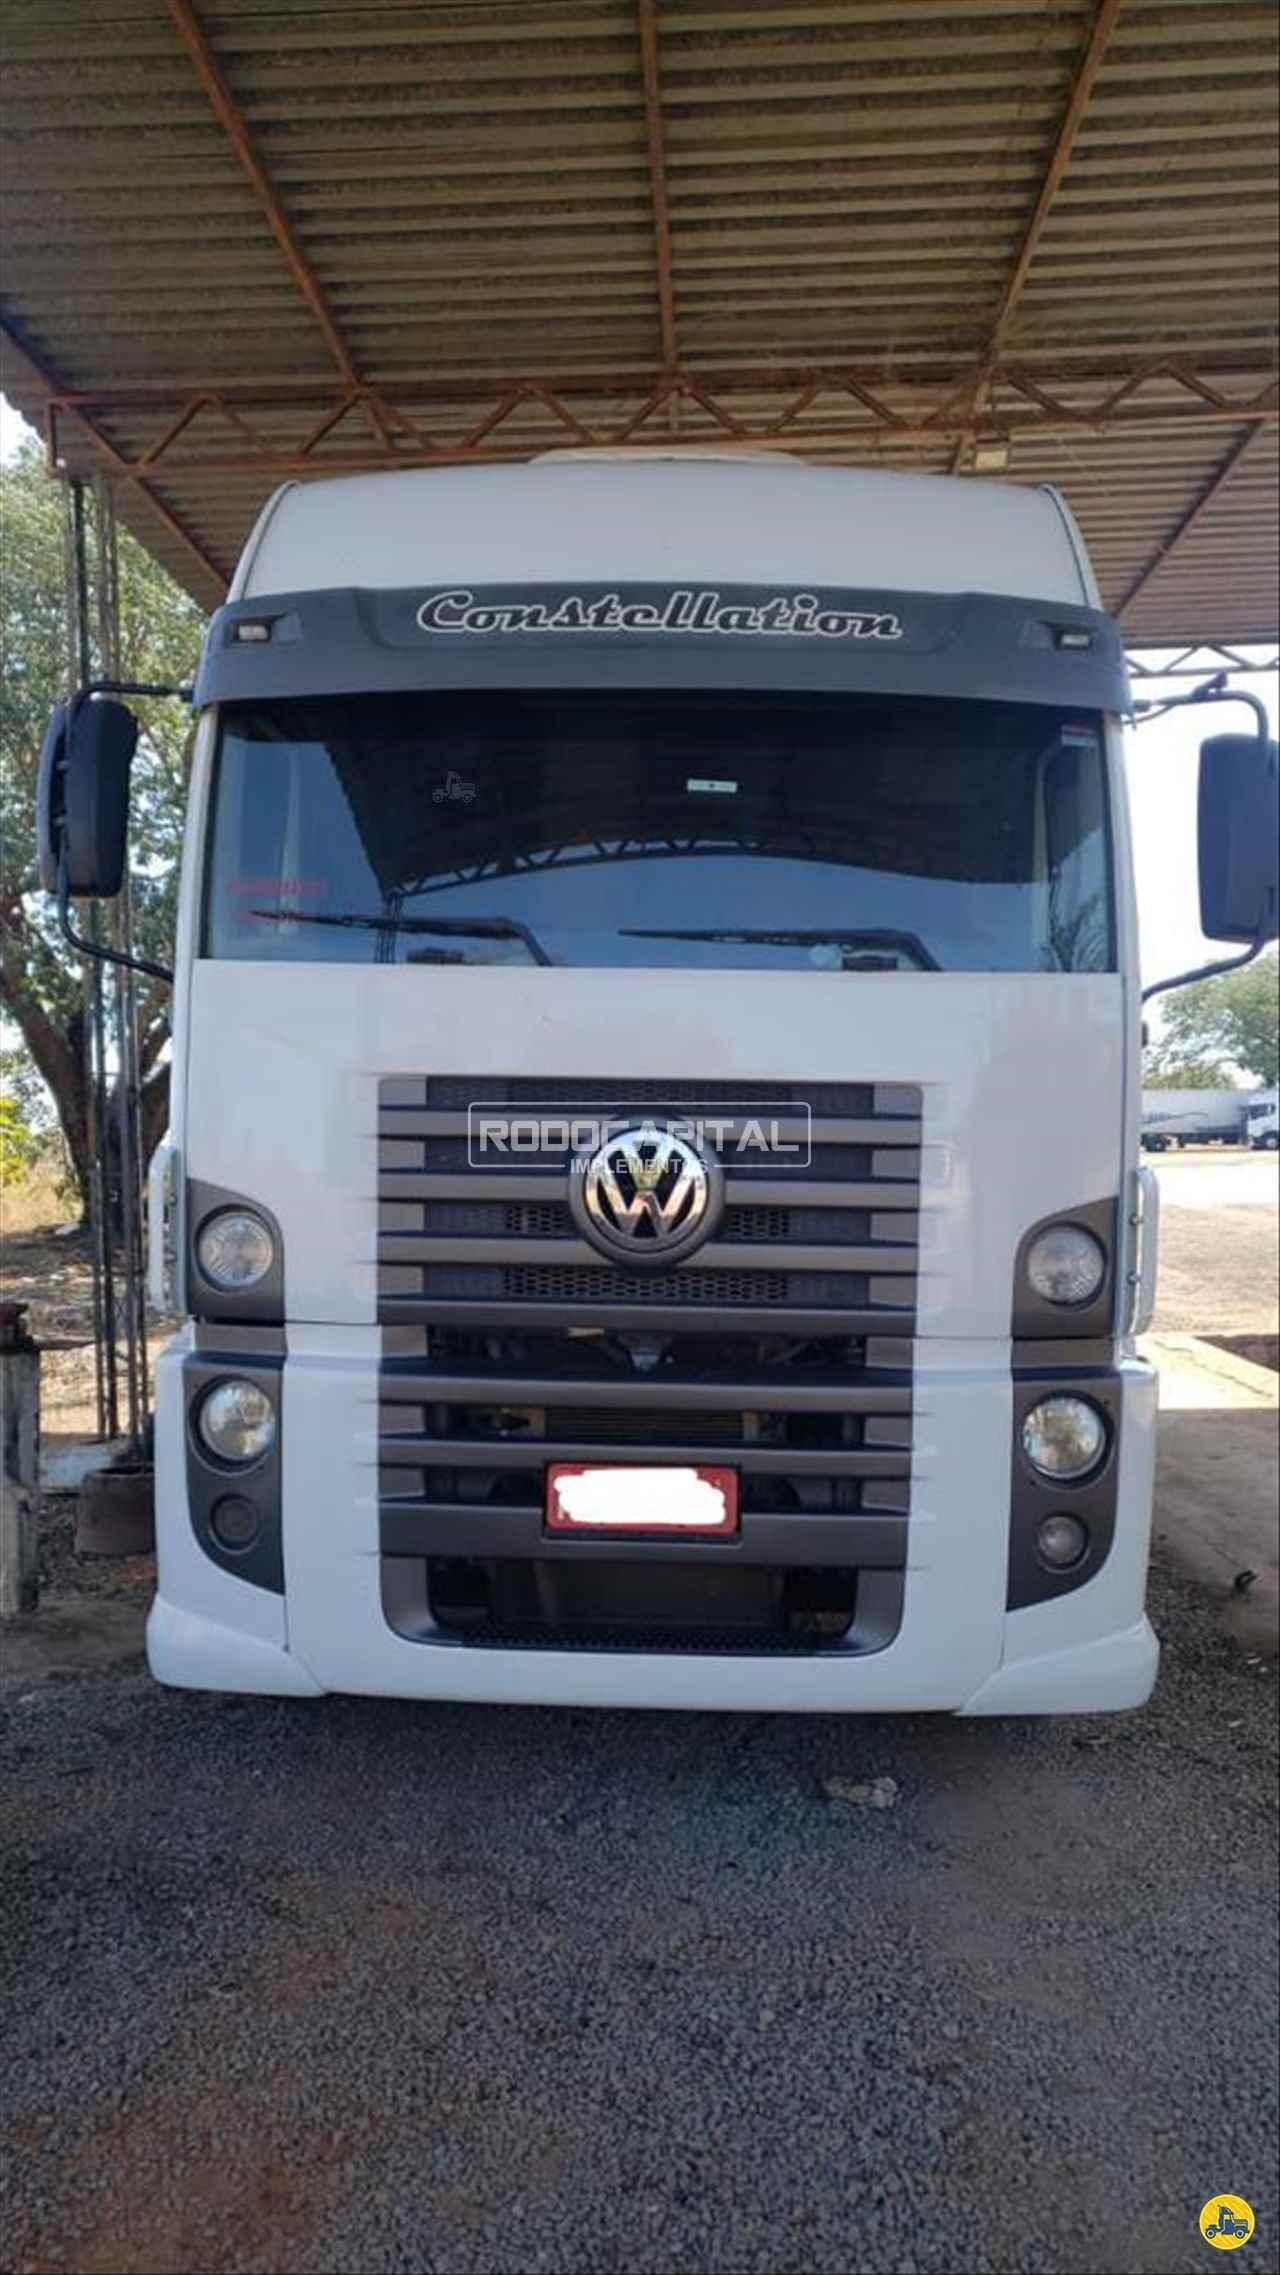 CAMINHAO VOLKSWAGEN VW 25390 Cavalo Mecânico Truck 6x2 RODOCAPITAL - TRUCKVAN BRASILIA DISTRITO FEDERAL DF